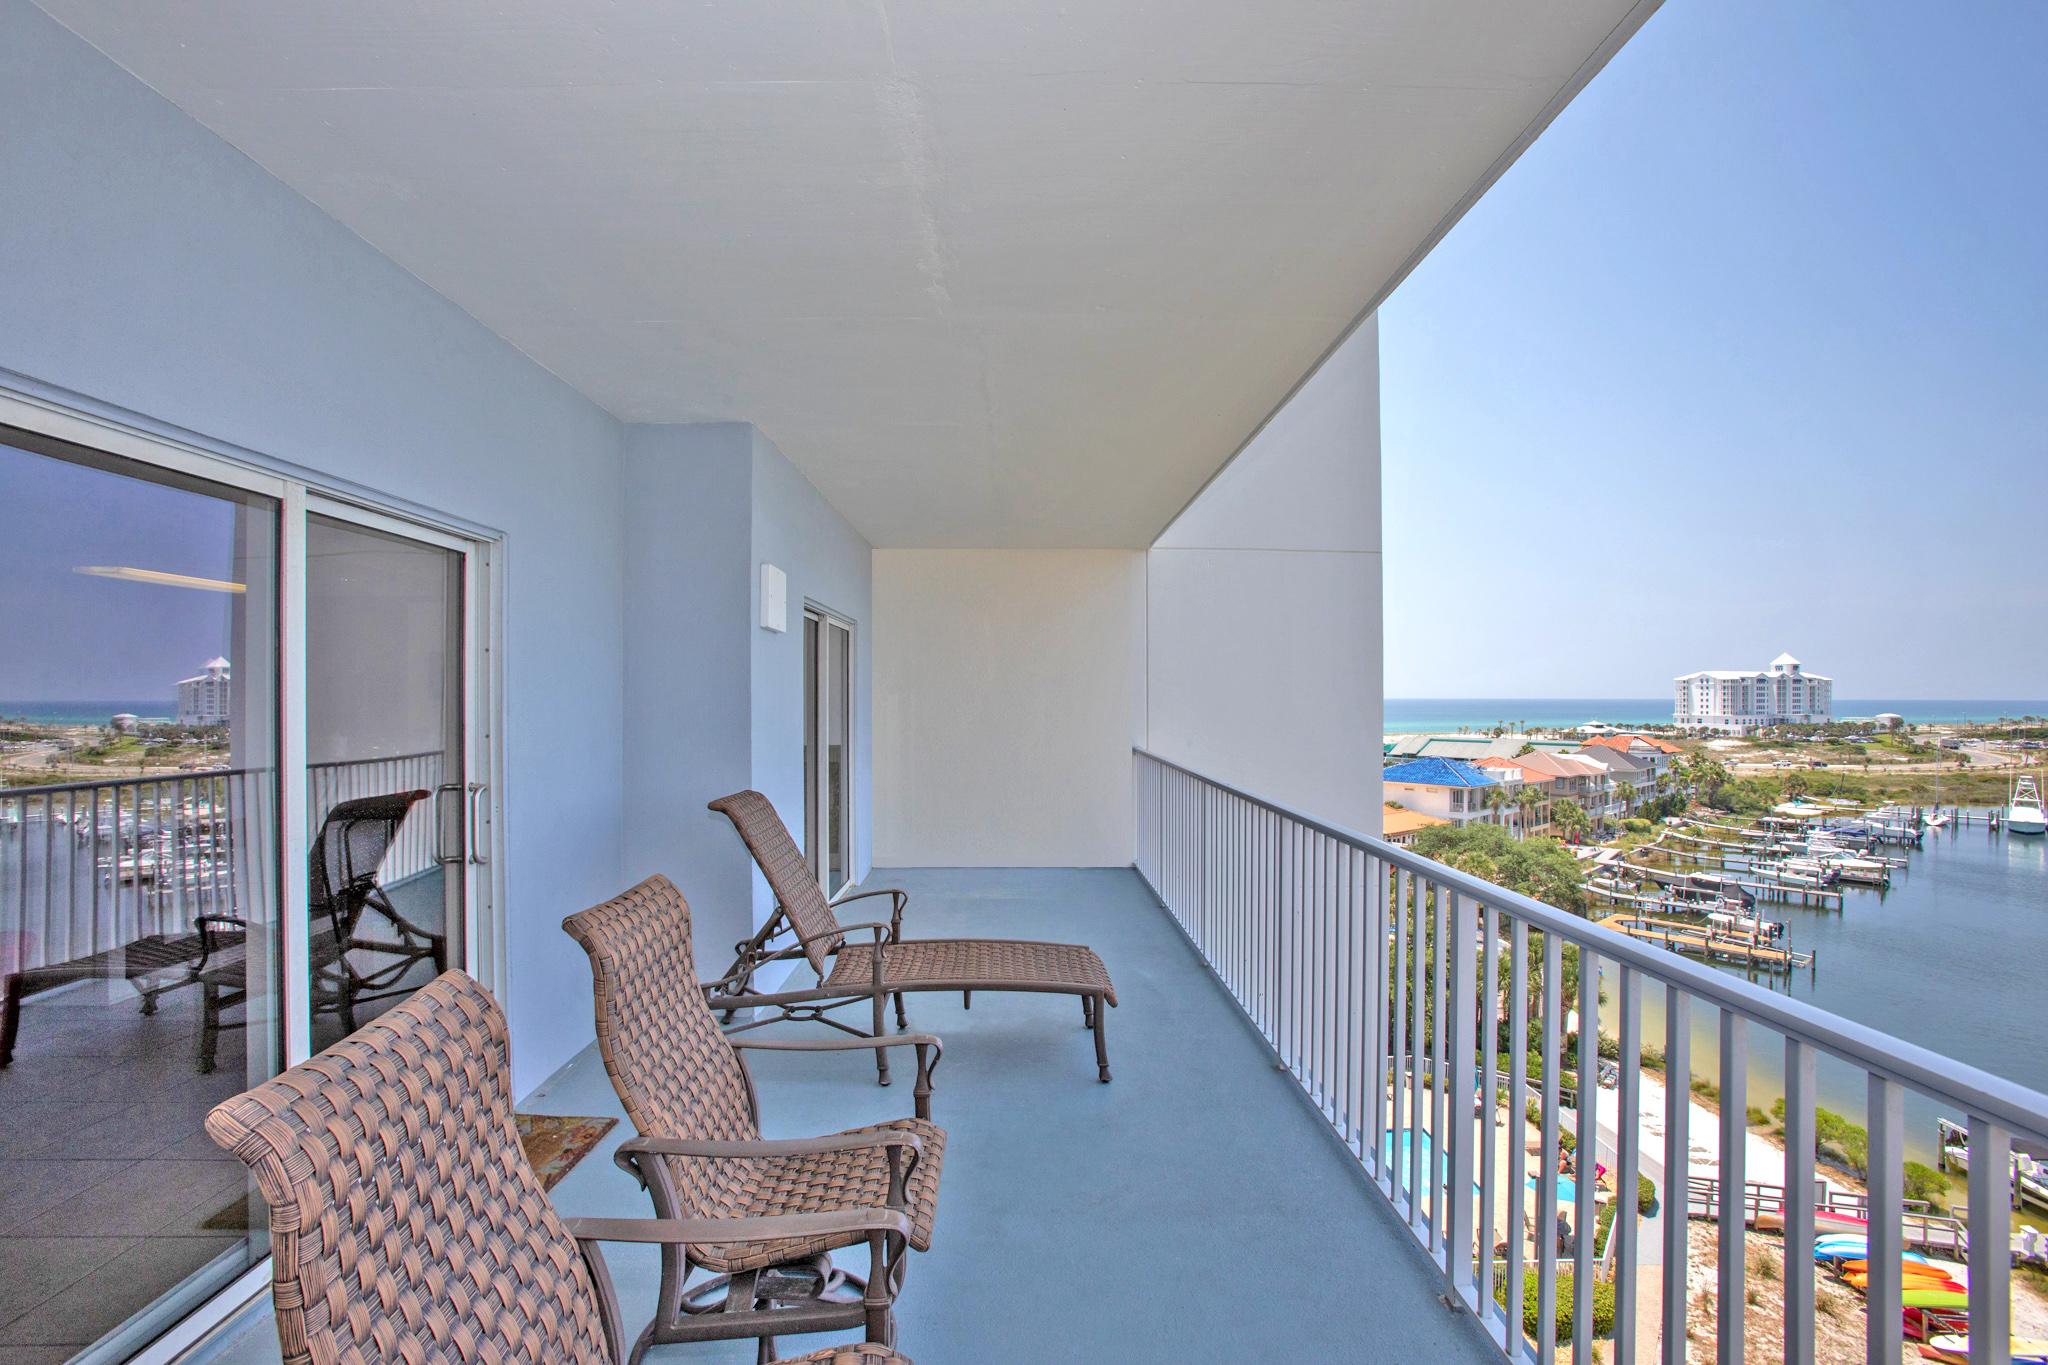 South Harbour #7E Condo rental in South Harbour ~ Pensacola Beach Vacation Rentals by BeachGuide in Pensacola Beach Florida - #17